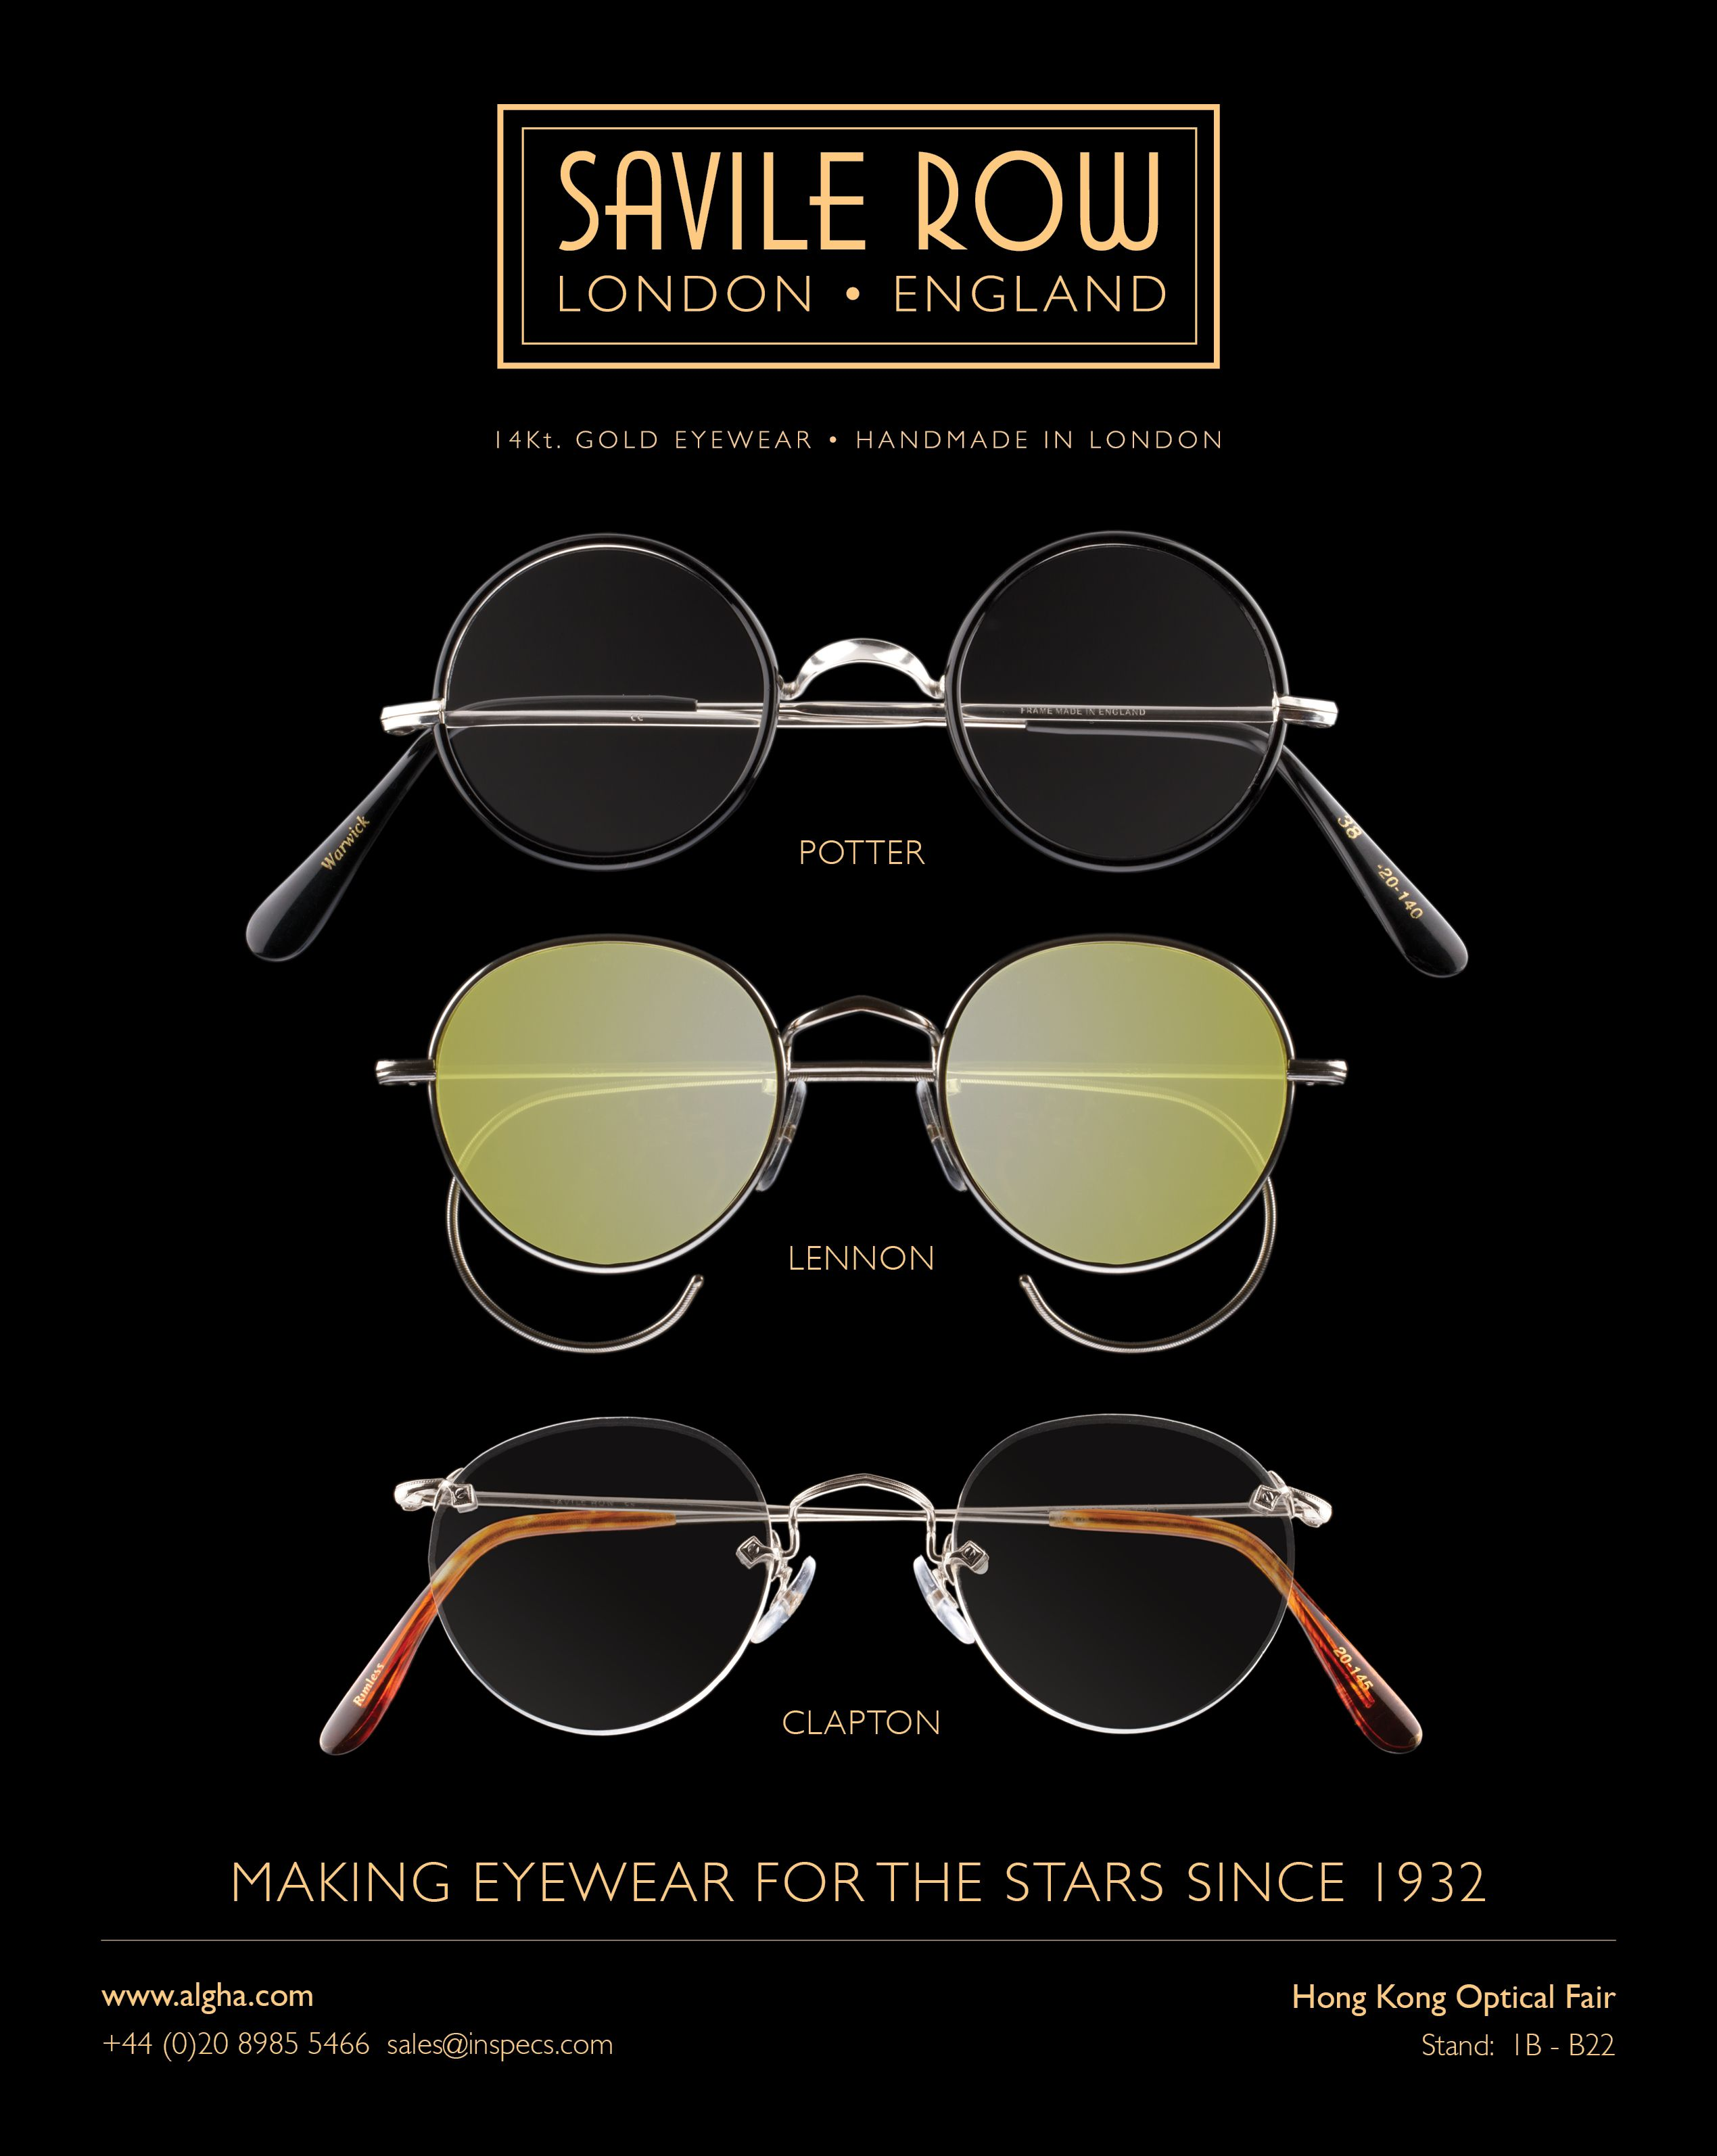 Savile Row Eyewear   Savile Row   Pinterest   Eyewear, Savile row ... 33a17ffd7a